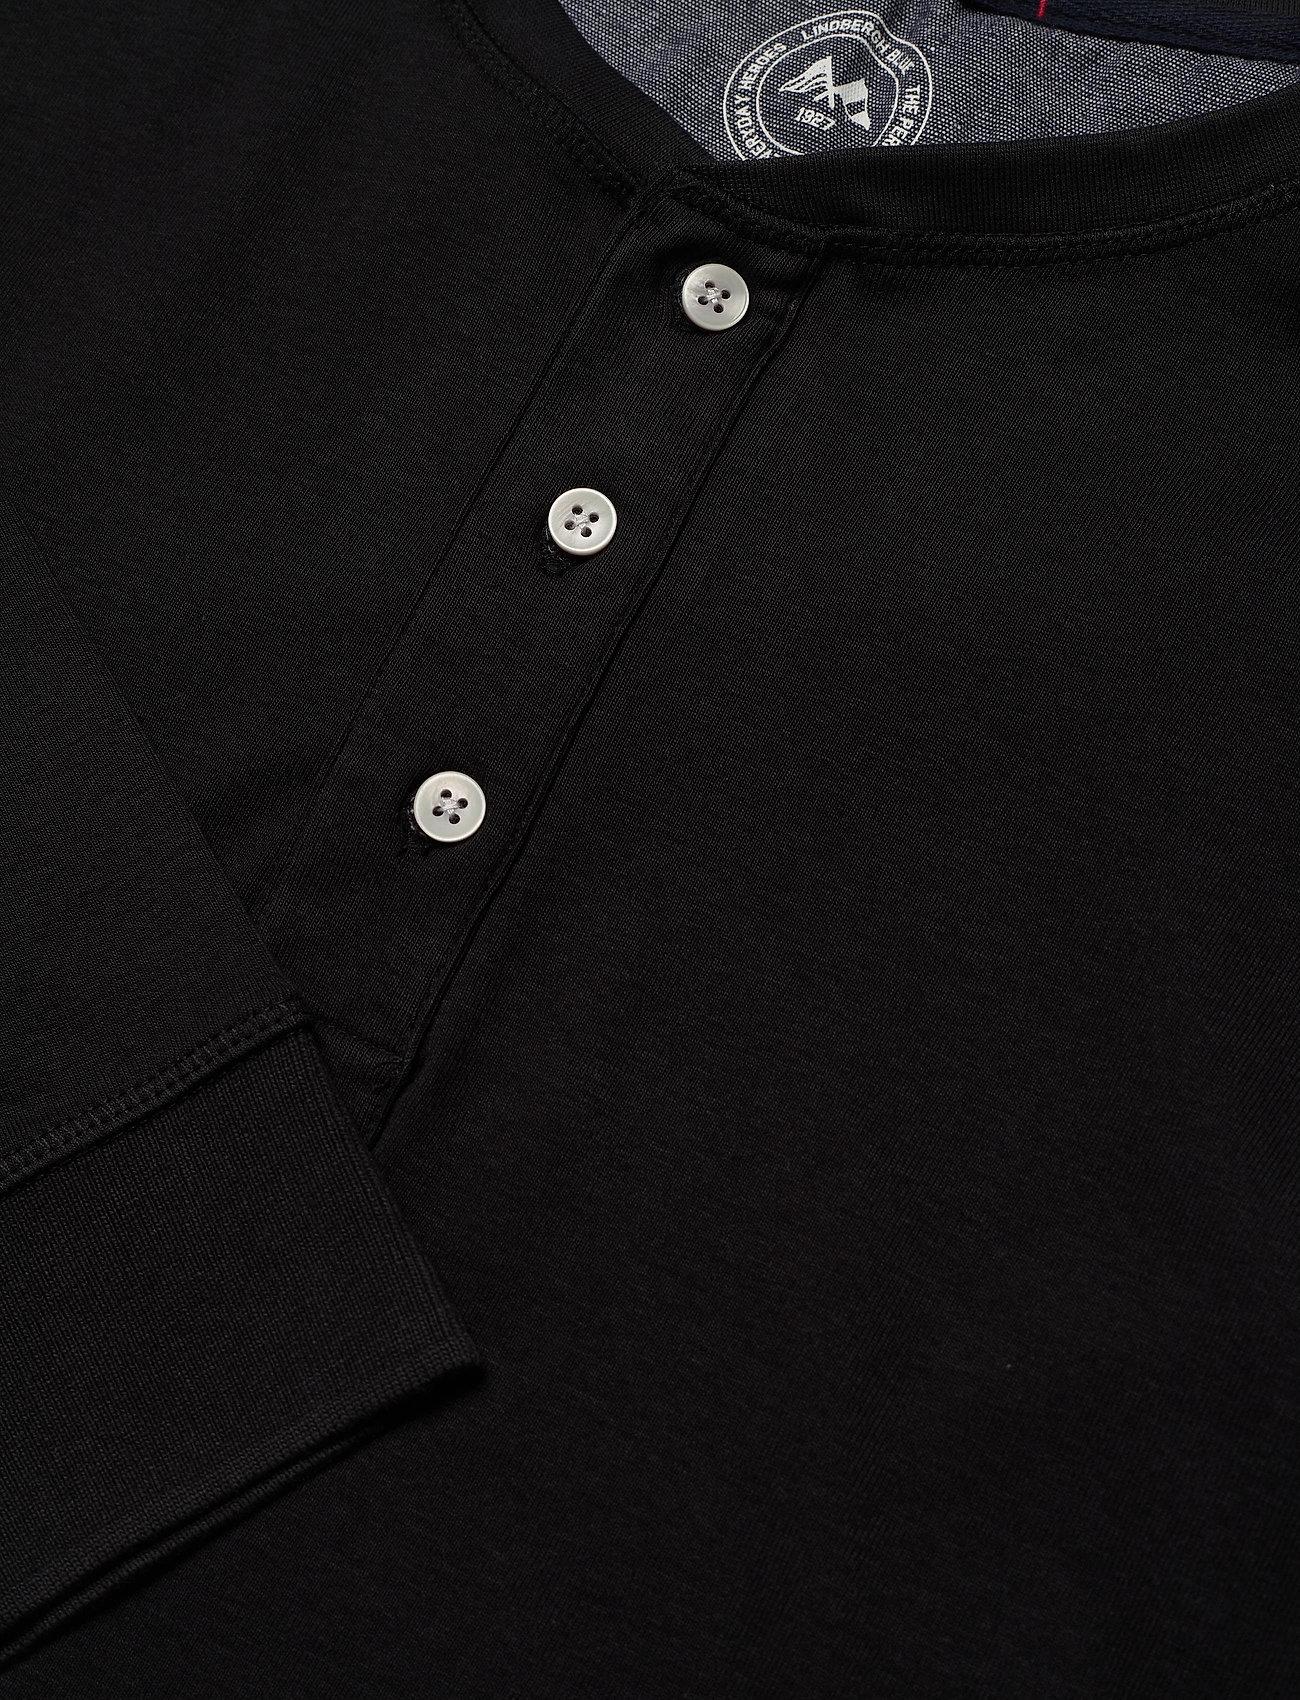 Lindbergh Ribbed granddad L/S - T-skjorter BLACK - Menn Klær